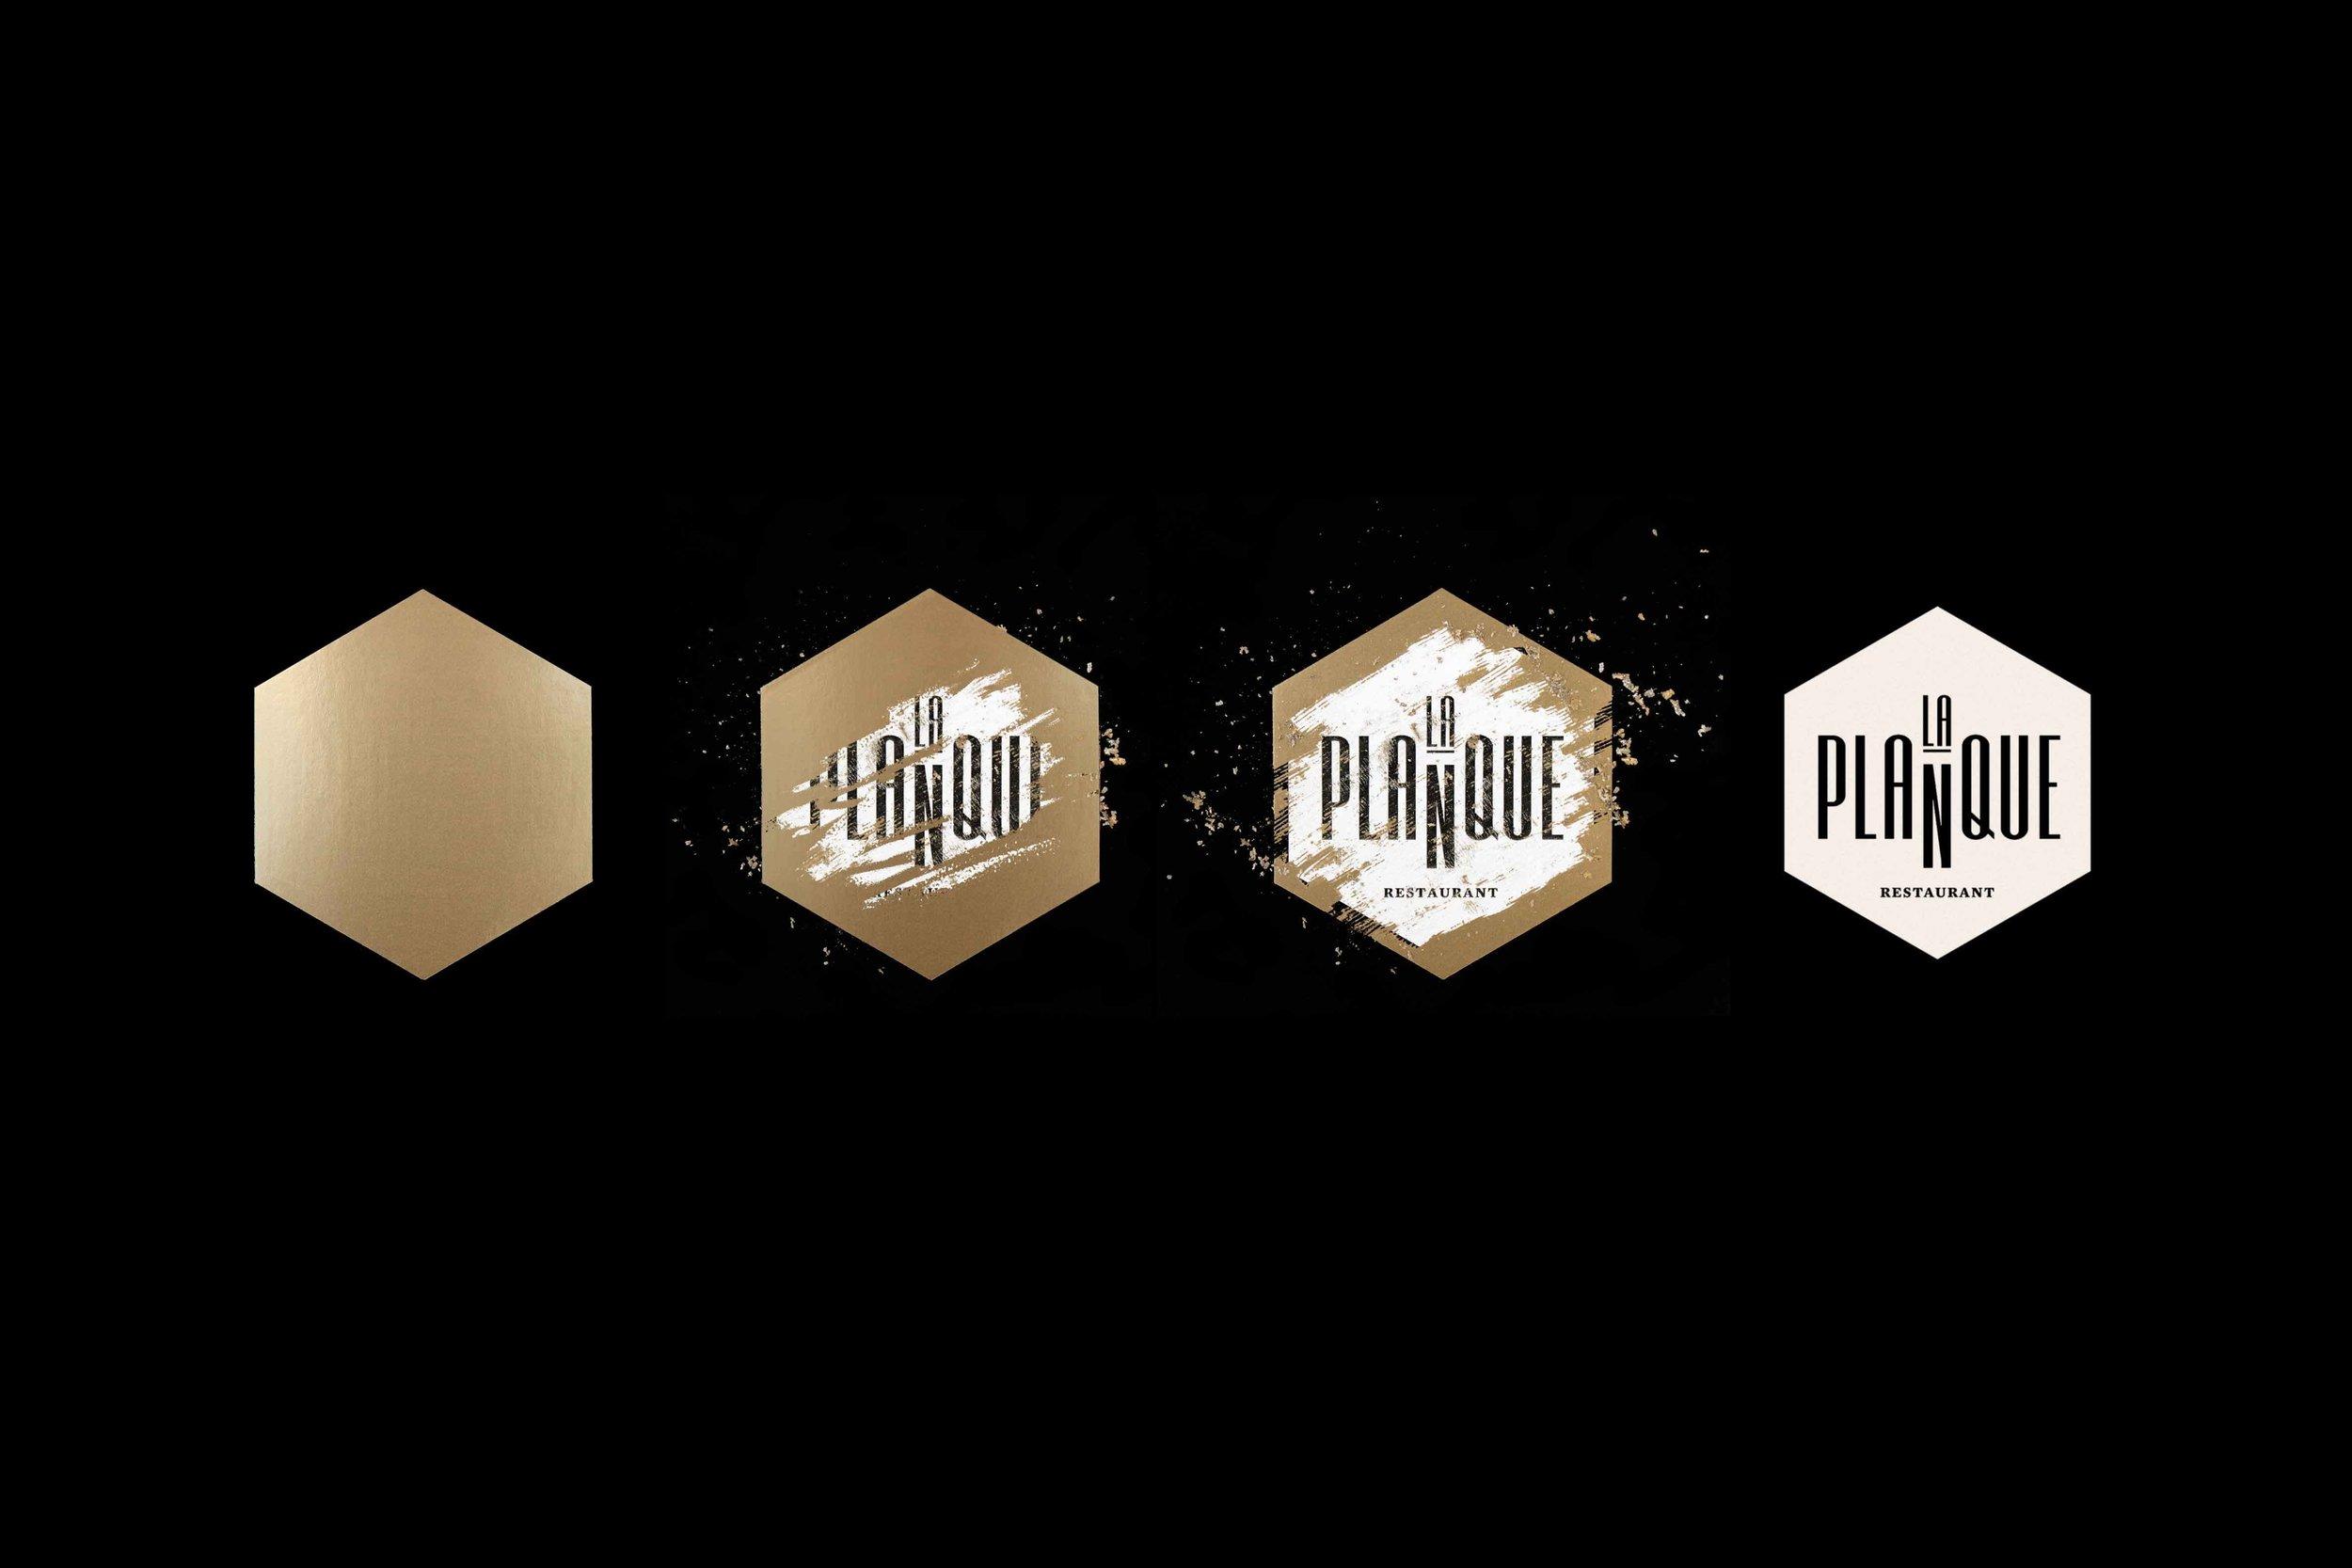 Design graphique-Branding-Logo-Restaurant-La planque-Québec